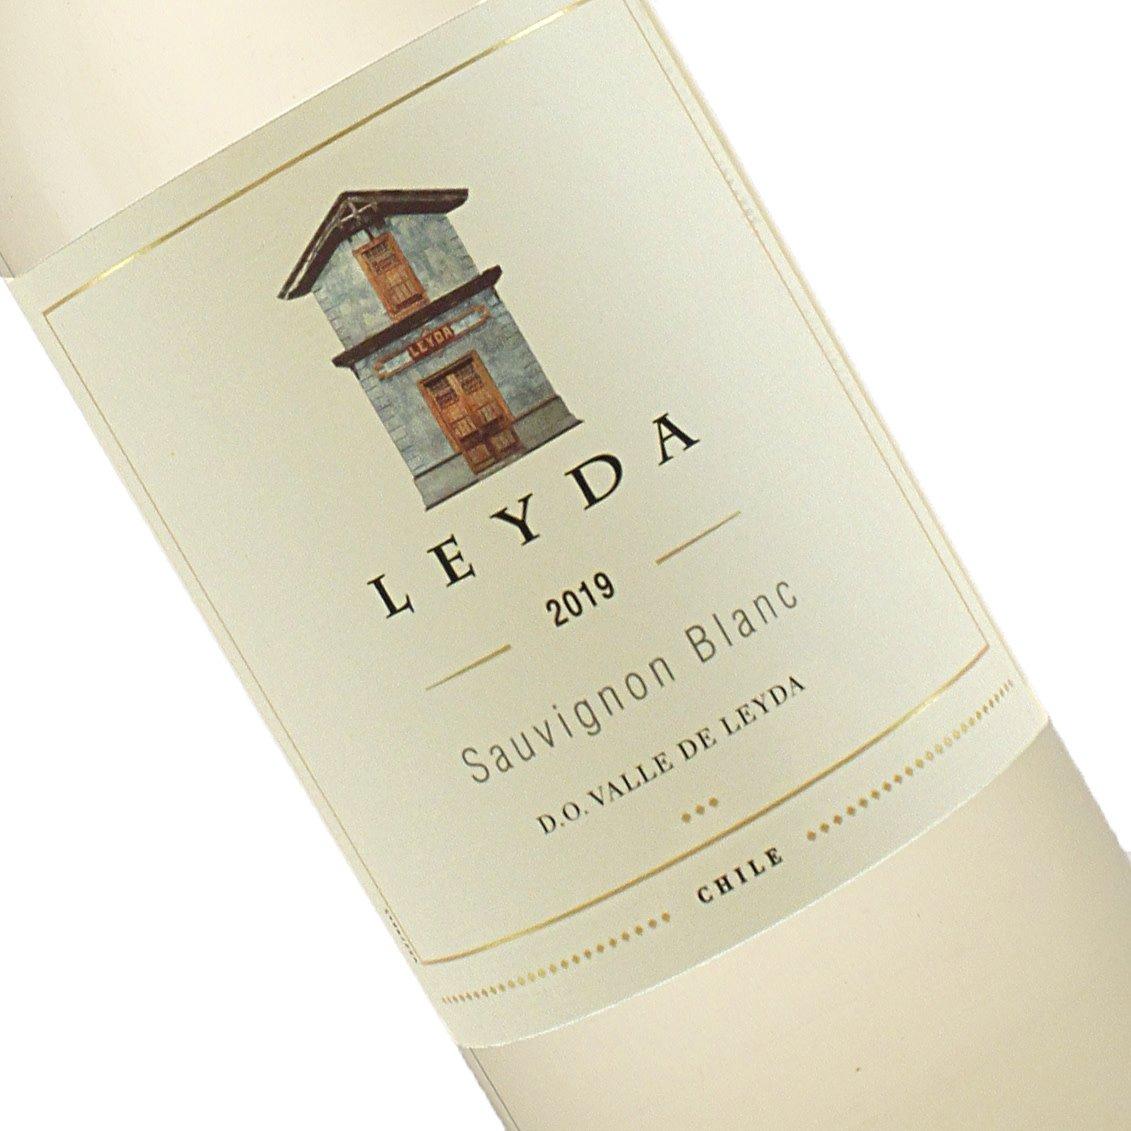 Leyda 2019 Sauvignon Blanc Leyda Valley, Chile